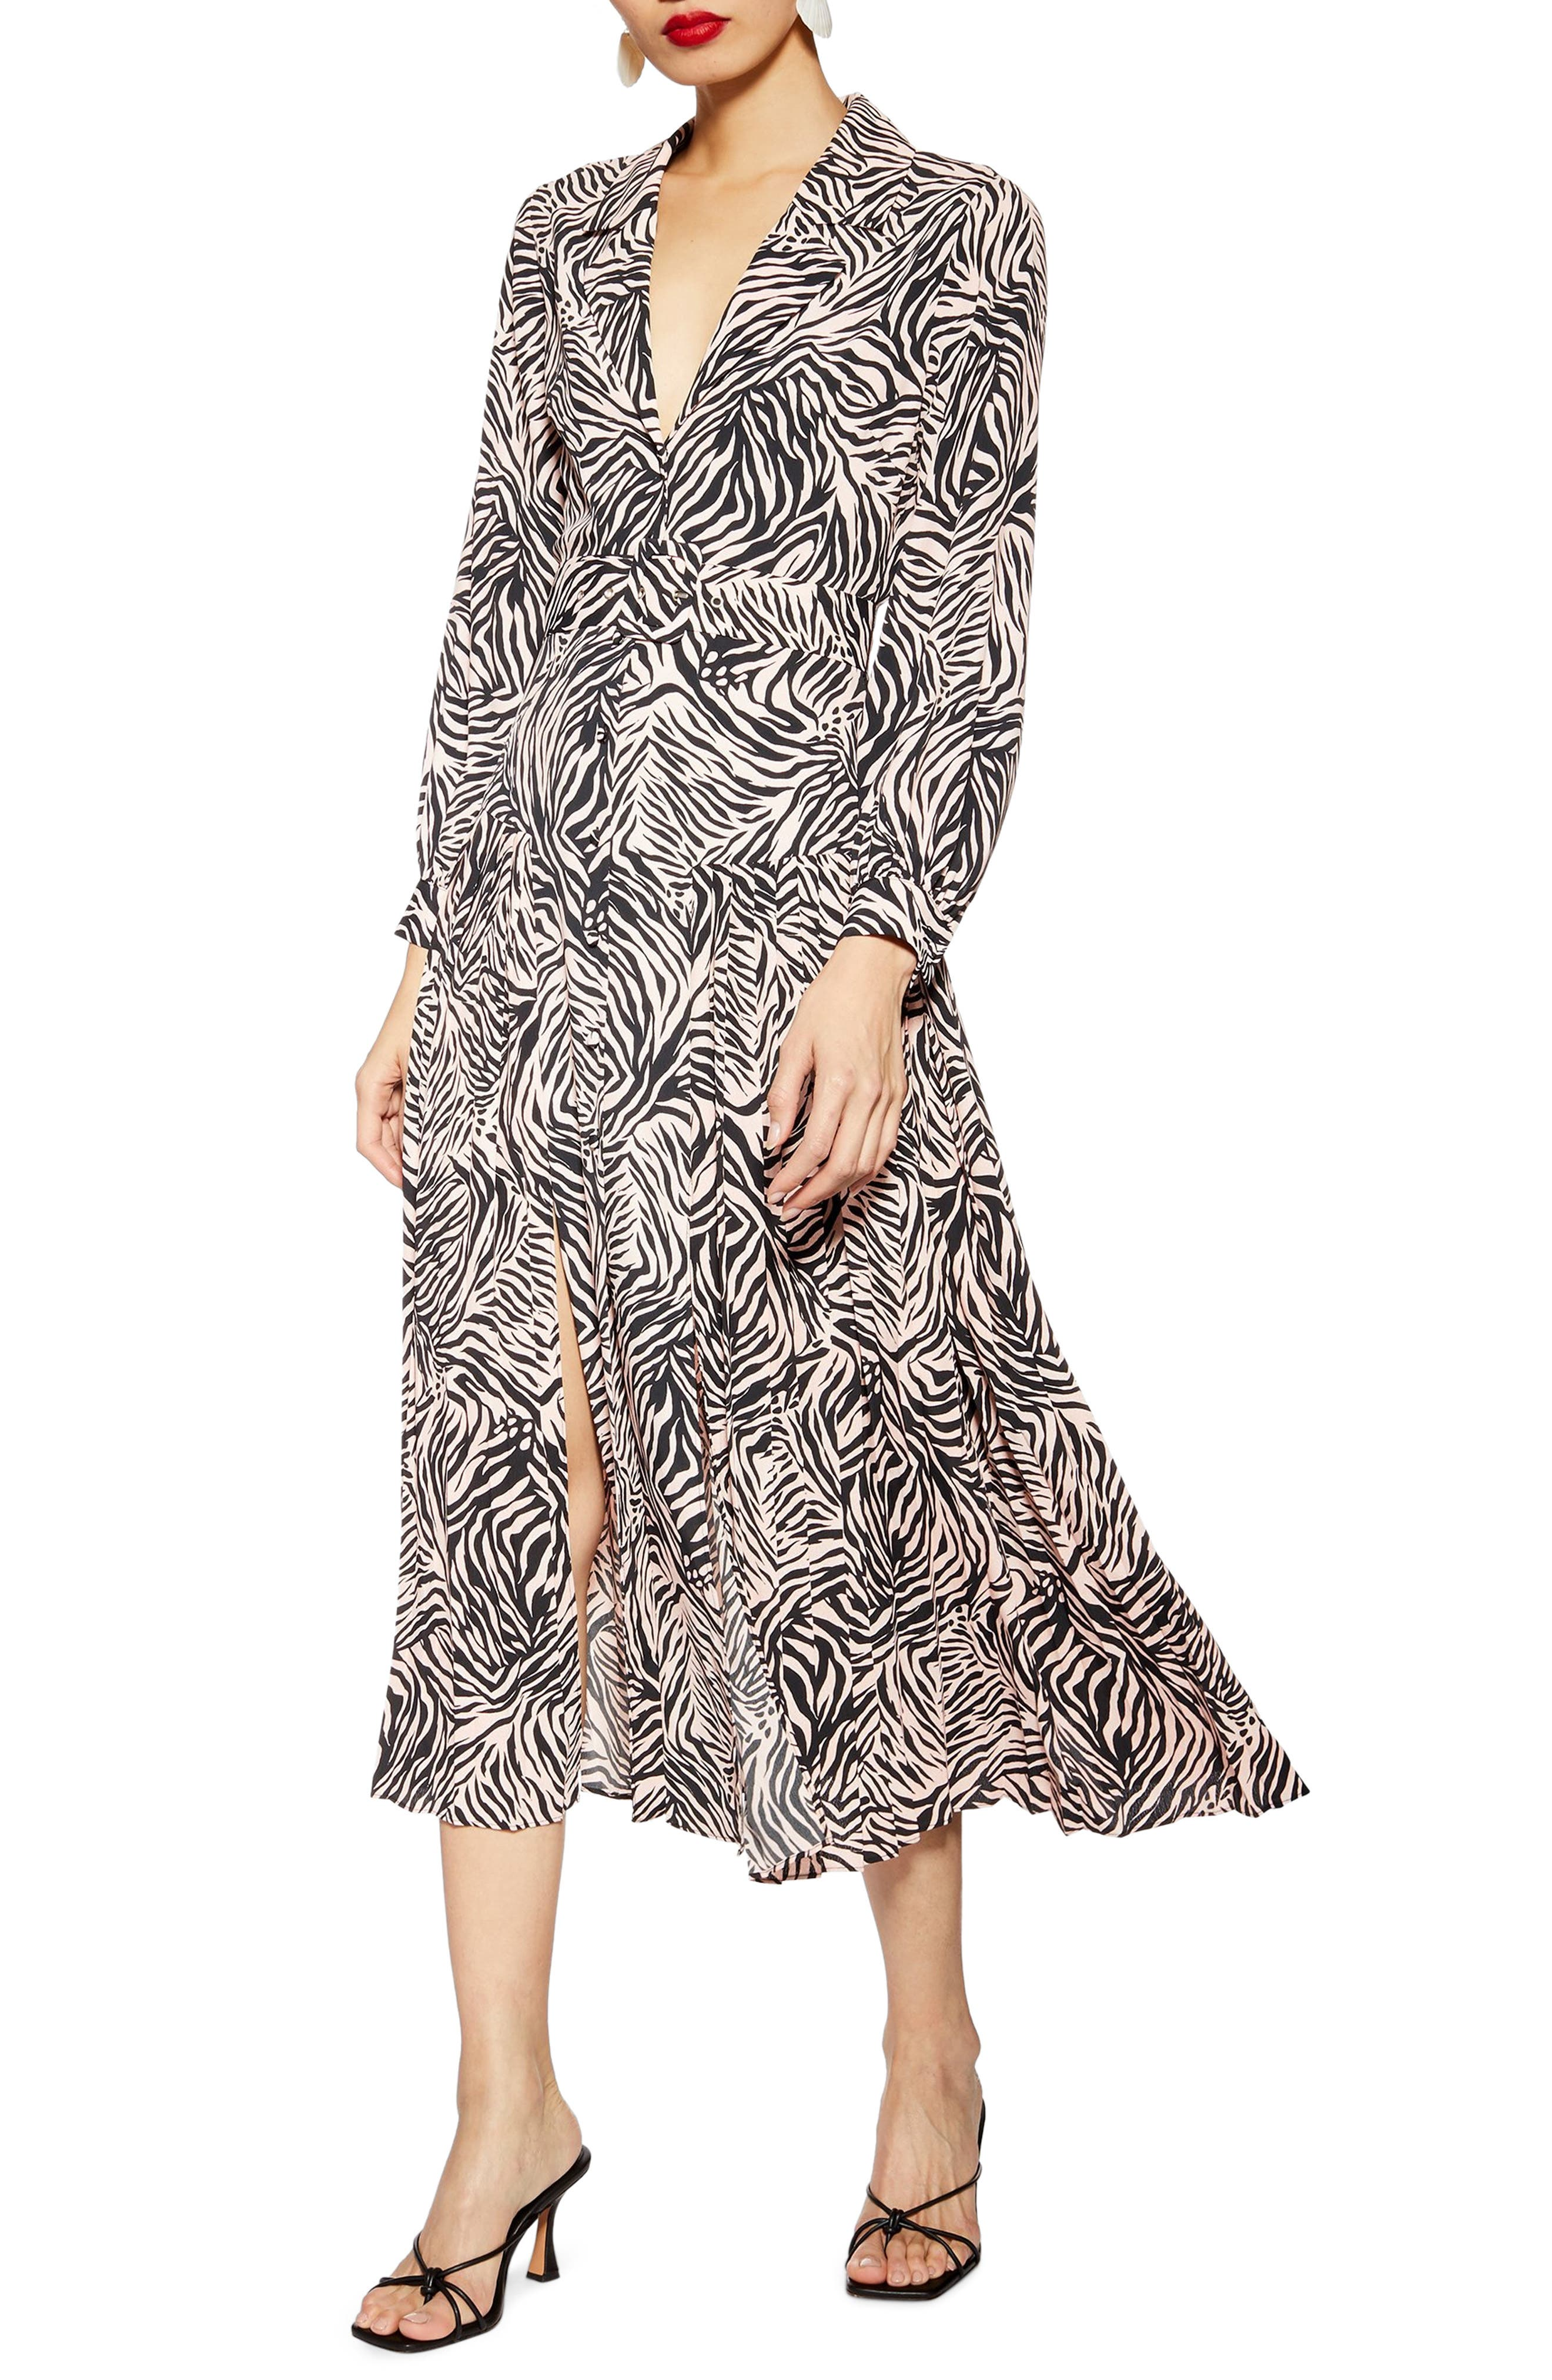 Petite Topshop Zebra Print Belted Midi Dress, US (fits like 00P) - Pink